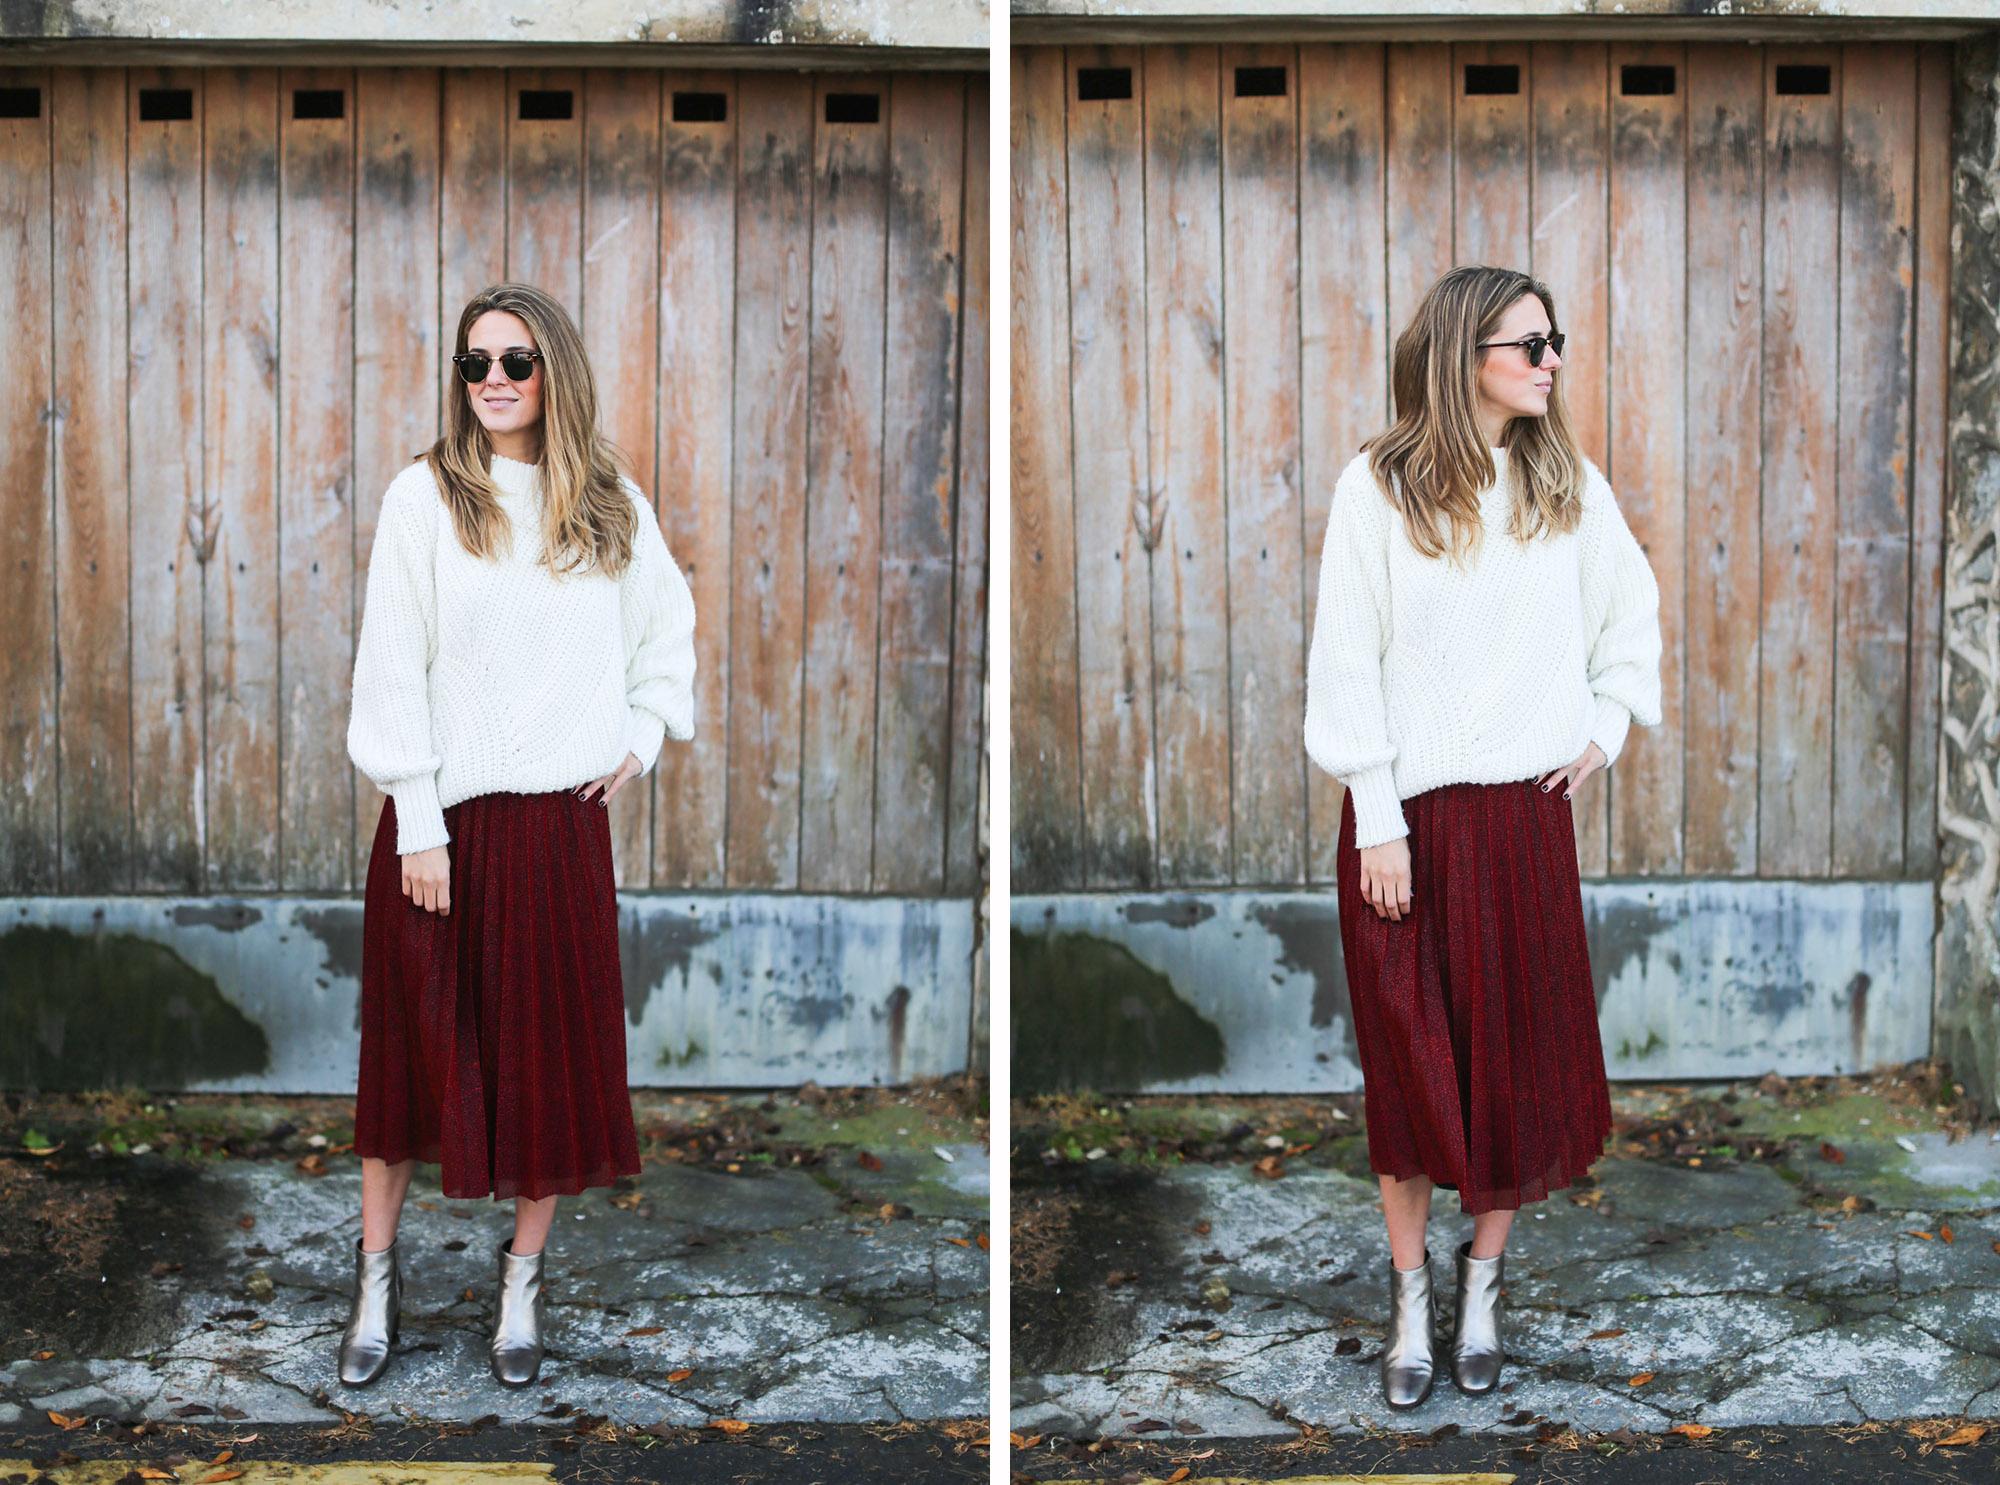 Clochet_streetstyle_fashionblogger_elcorteingles_gloriaortizbotinesbronce_faldaplisadarojaamitie-15